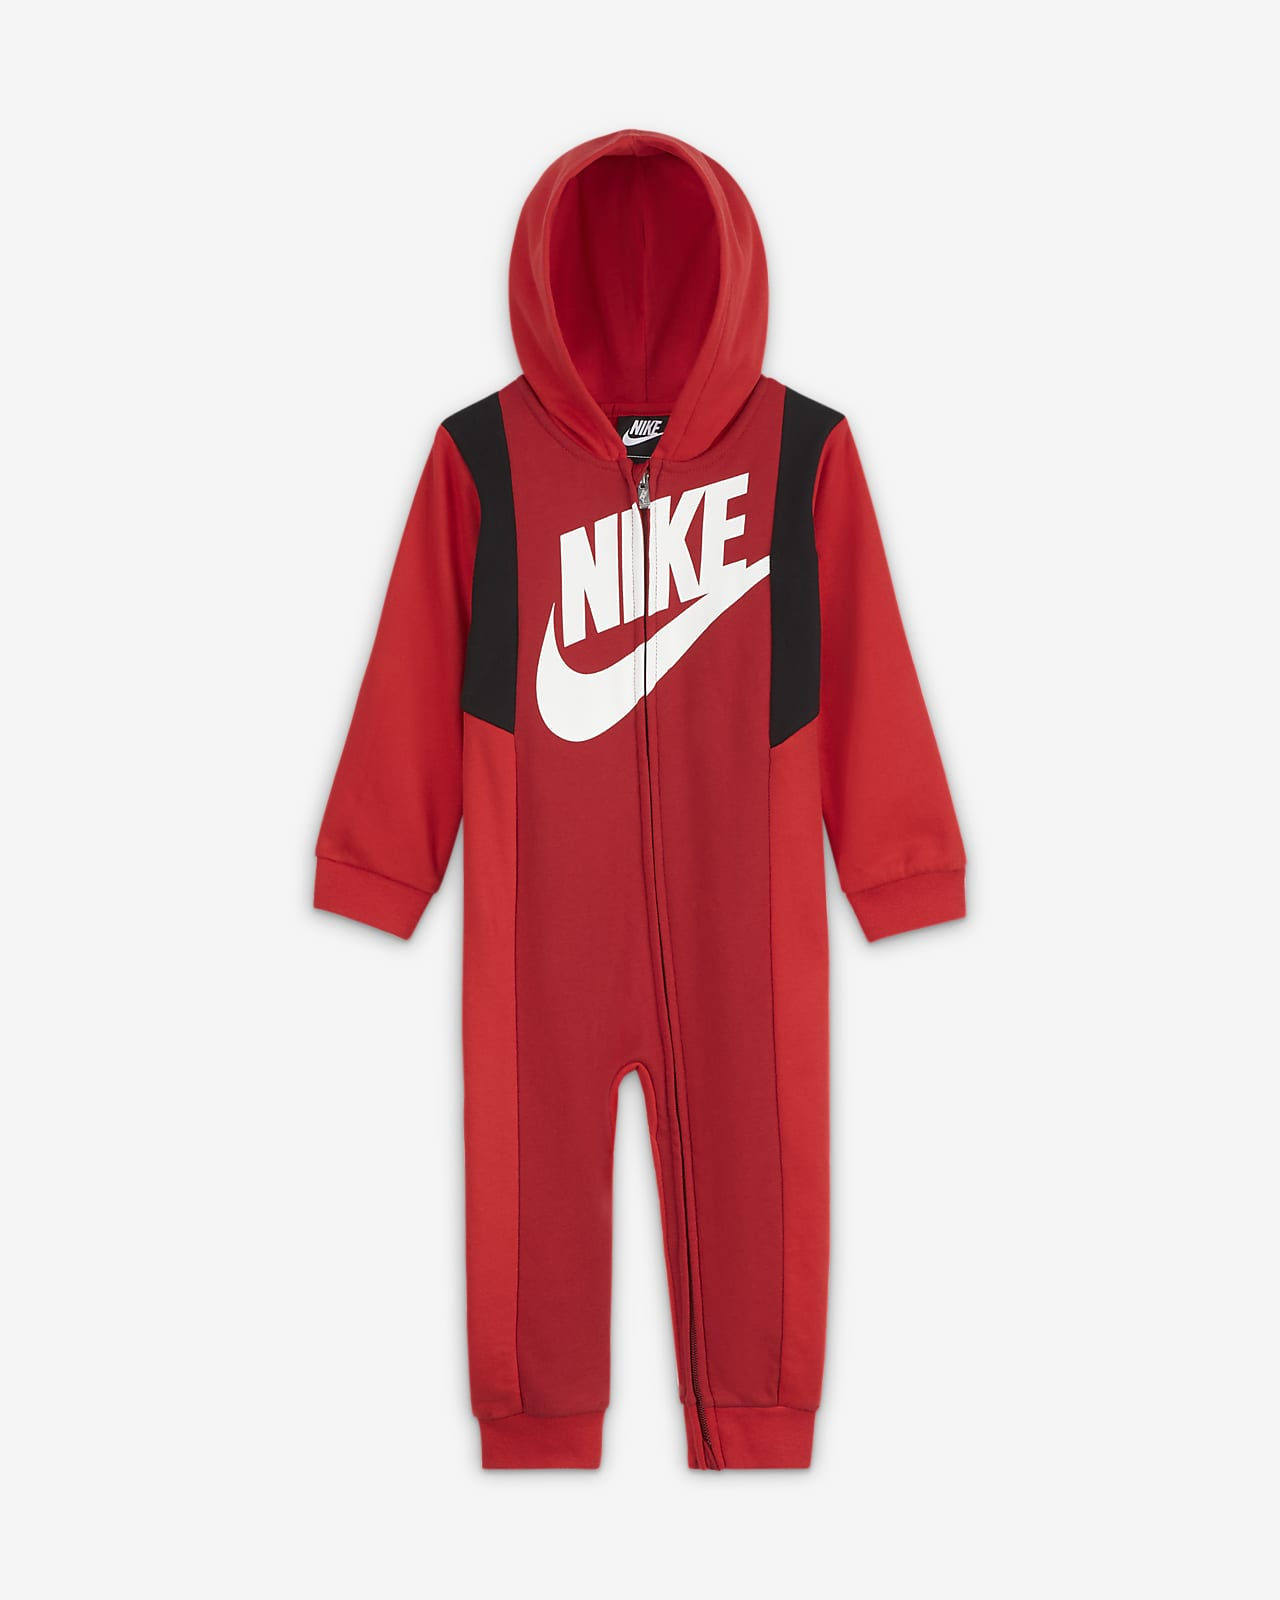 Nike Baby (12–24M) Overalls